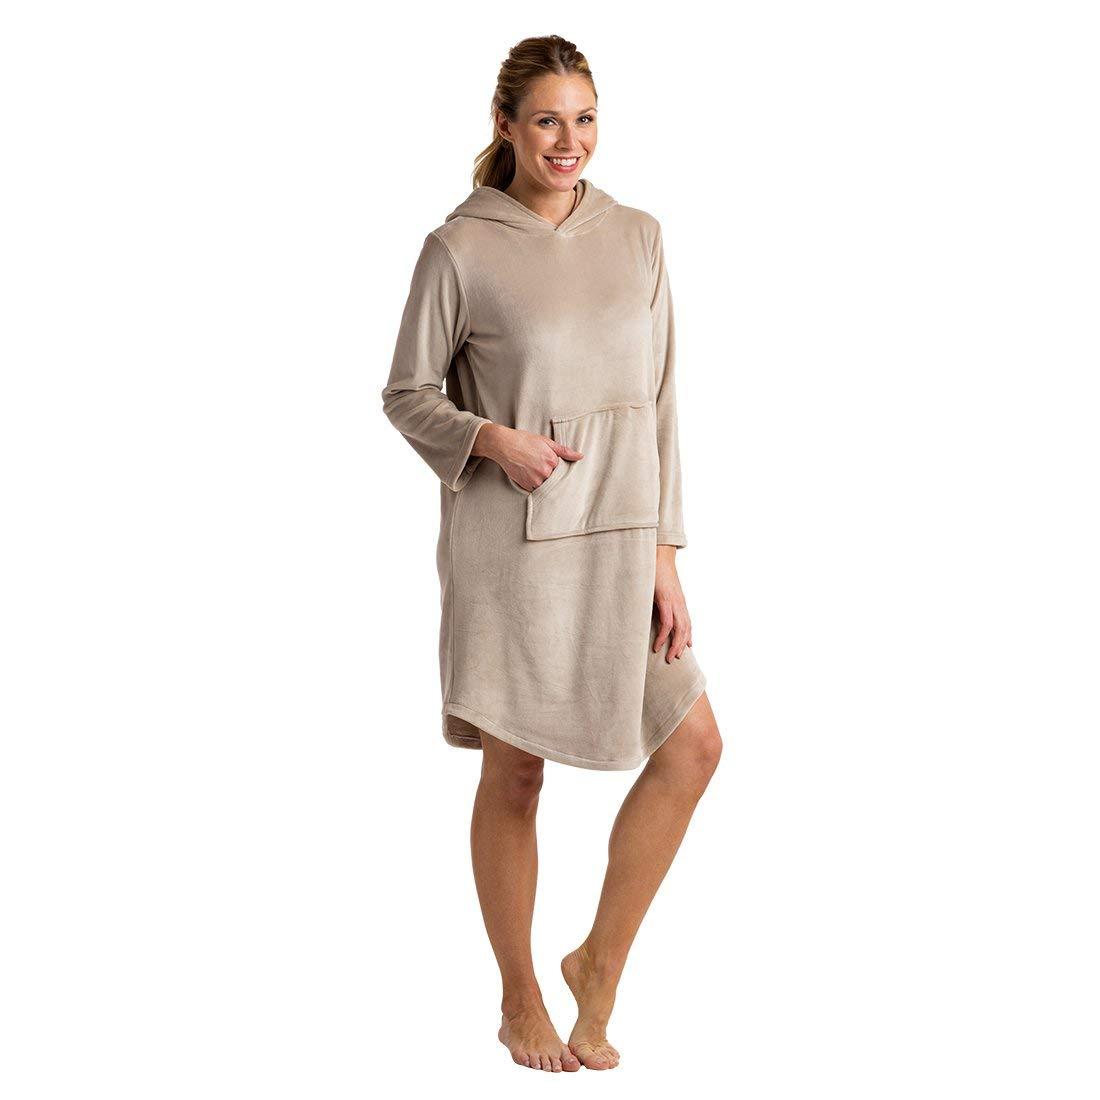 Softies Women's Ultra Soft Hooded Snuggle Lounger with Kangaroo Pocket, Oprah's Favorite Thing